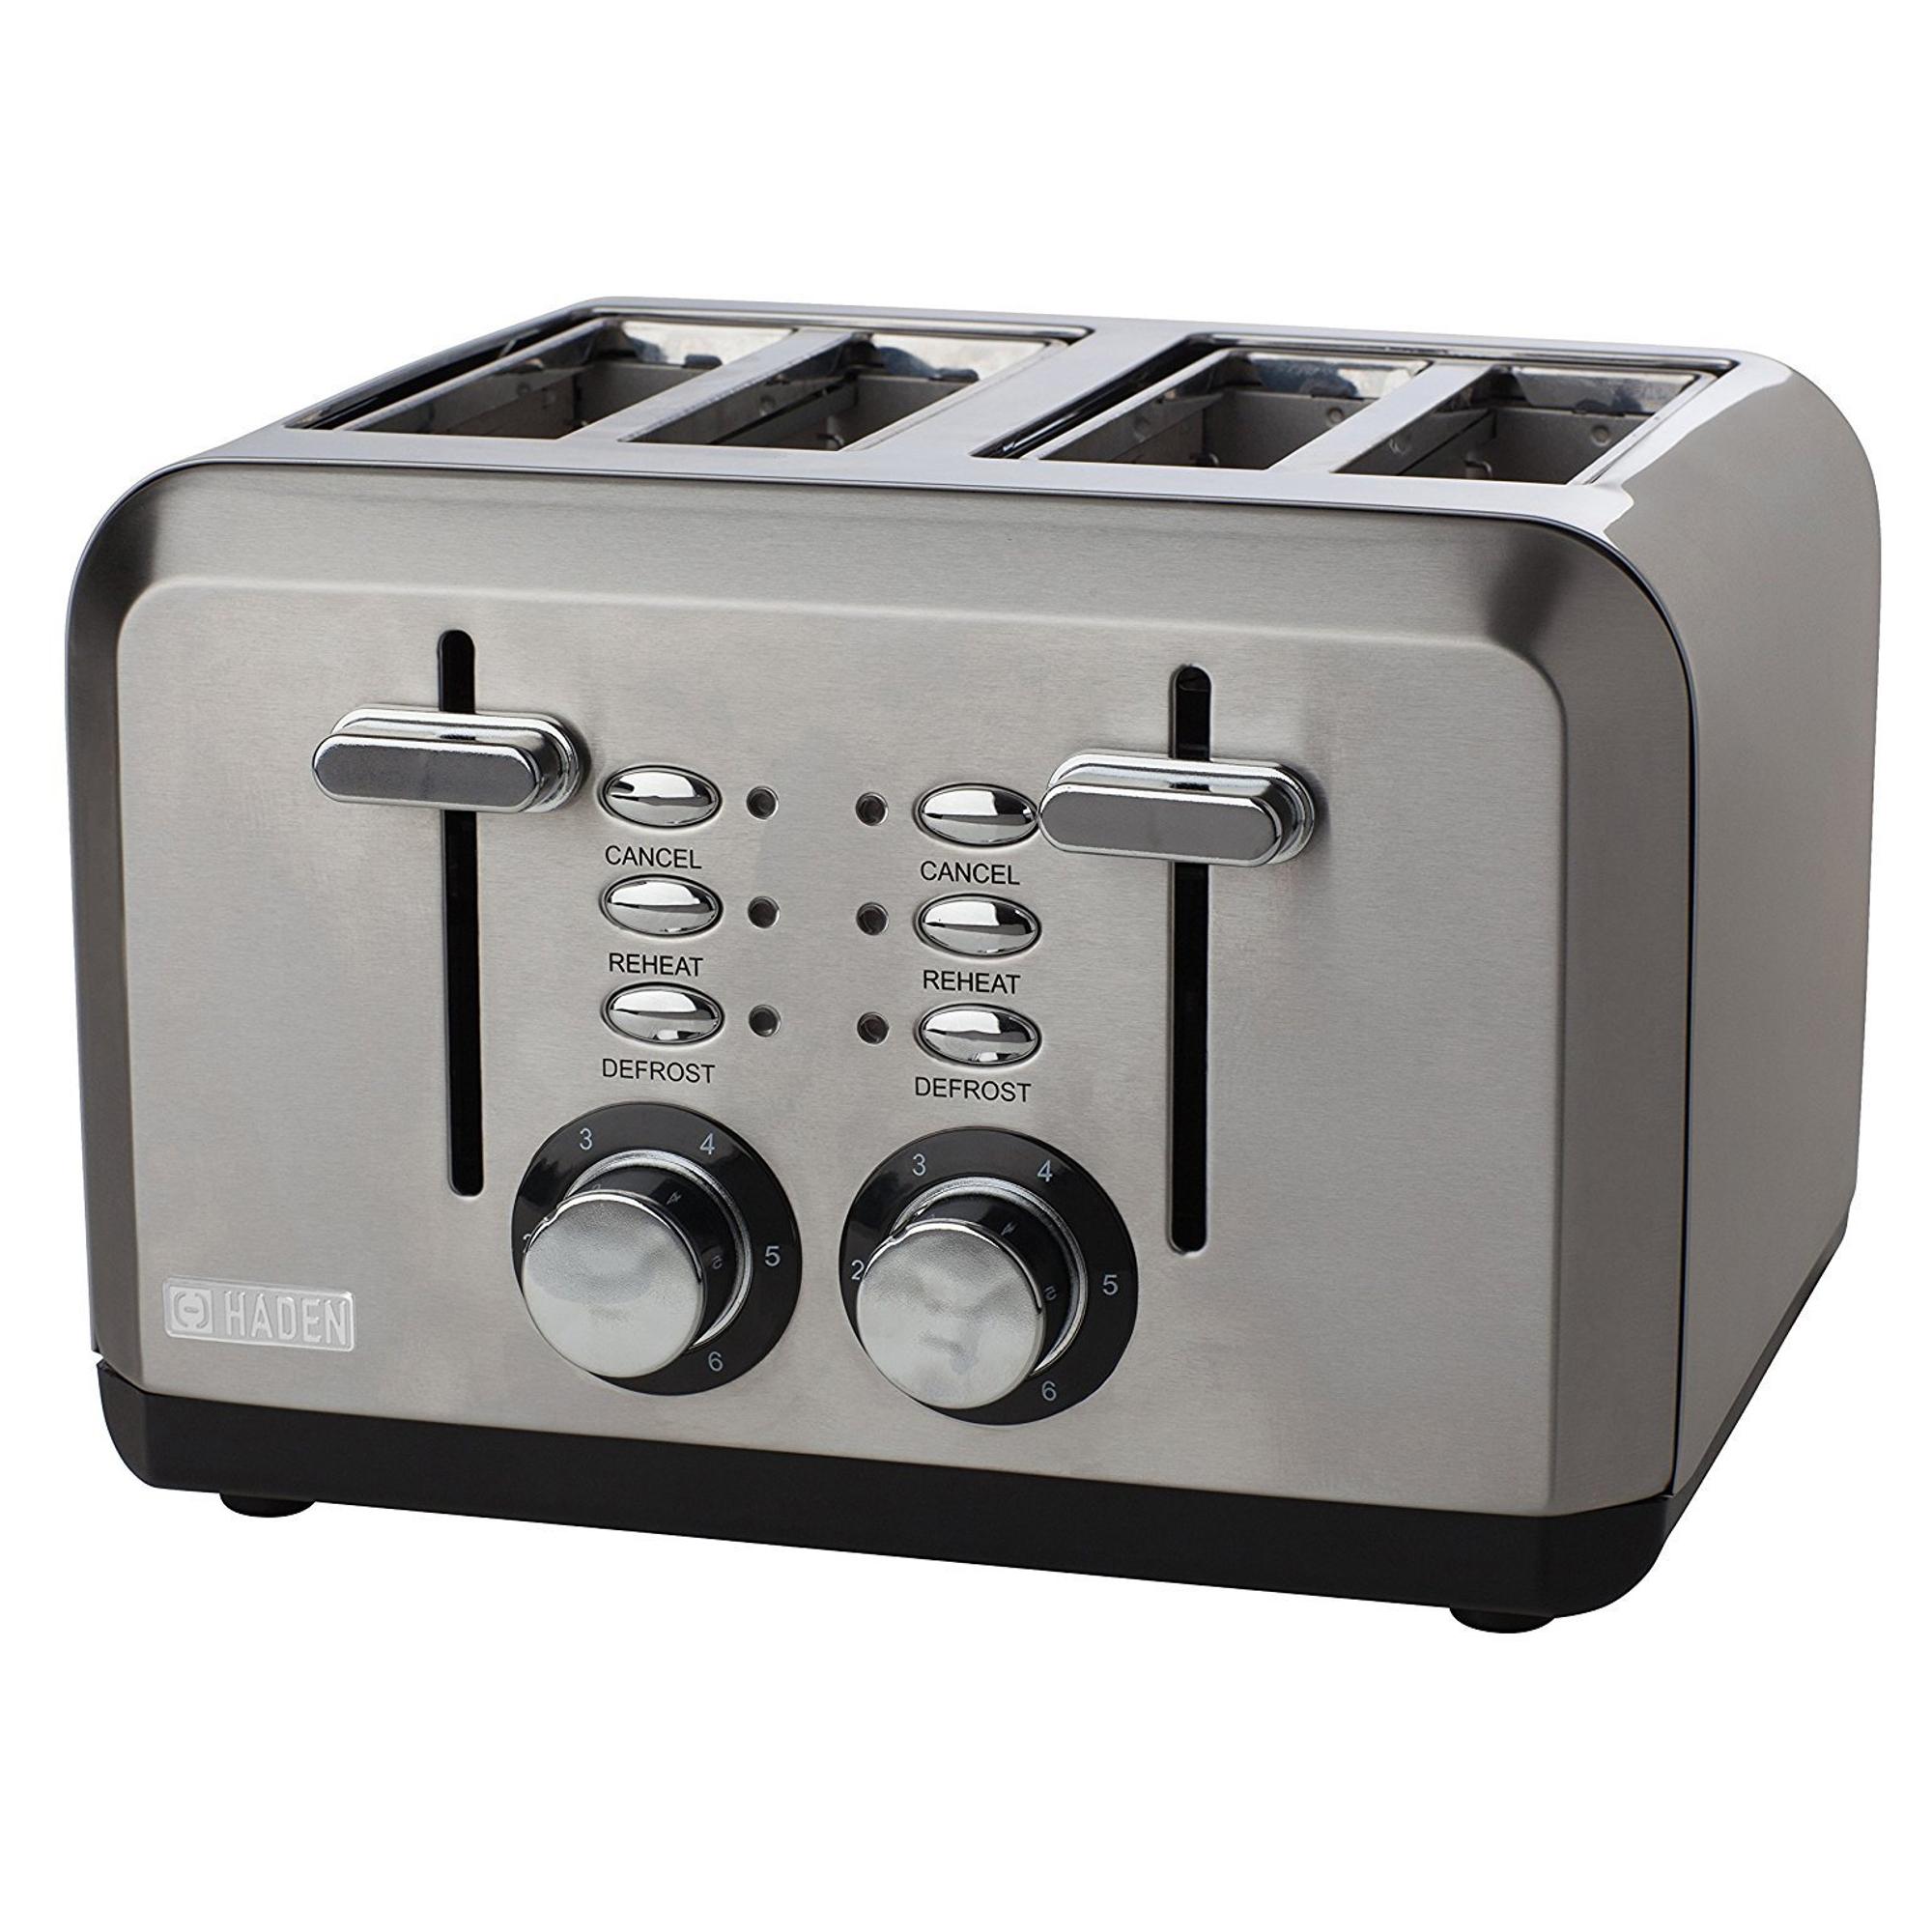 Haden 183477 1600w Sleek 4 Slice Toaster Hughes